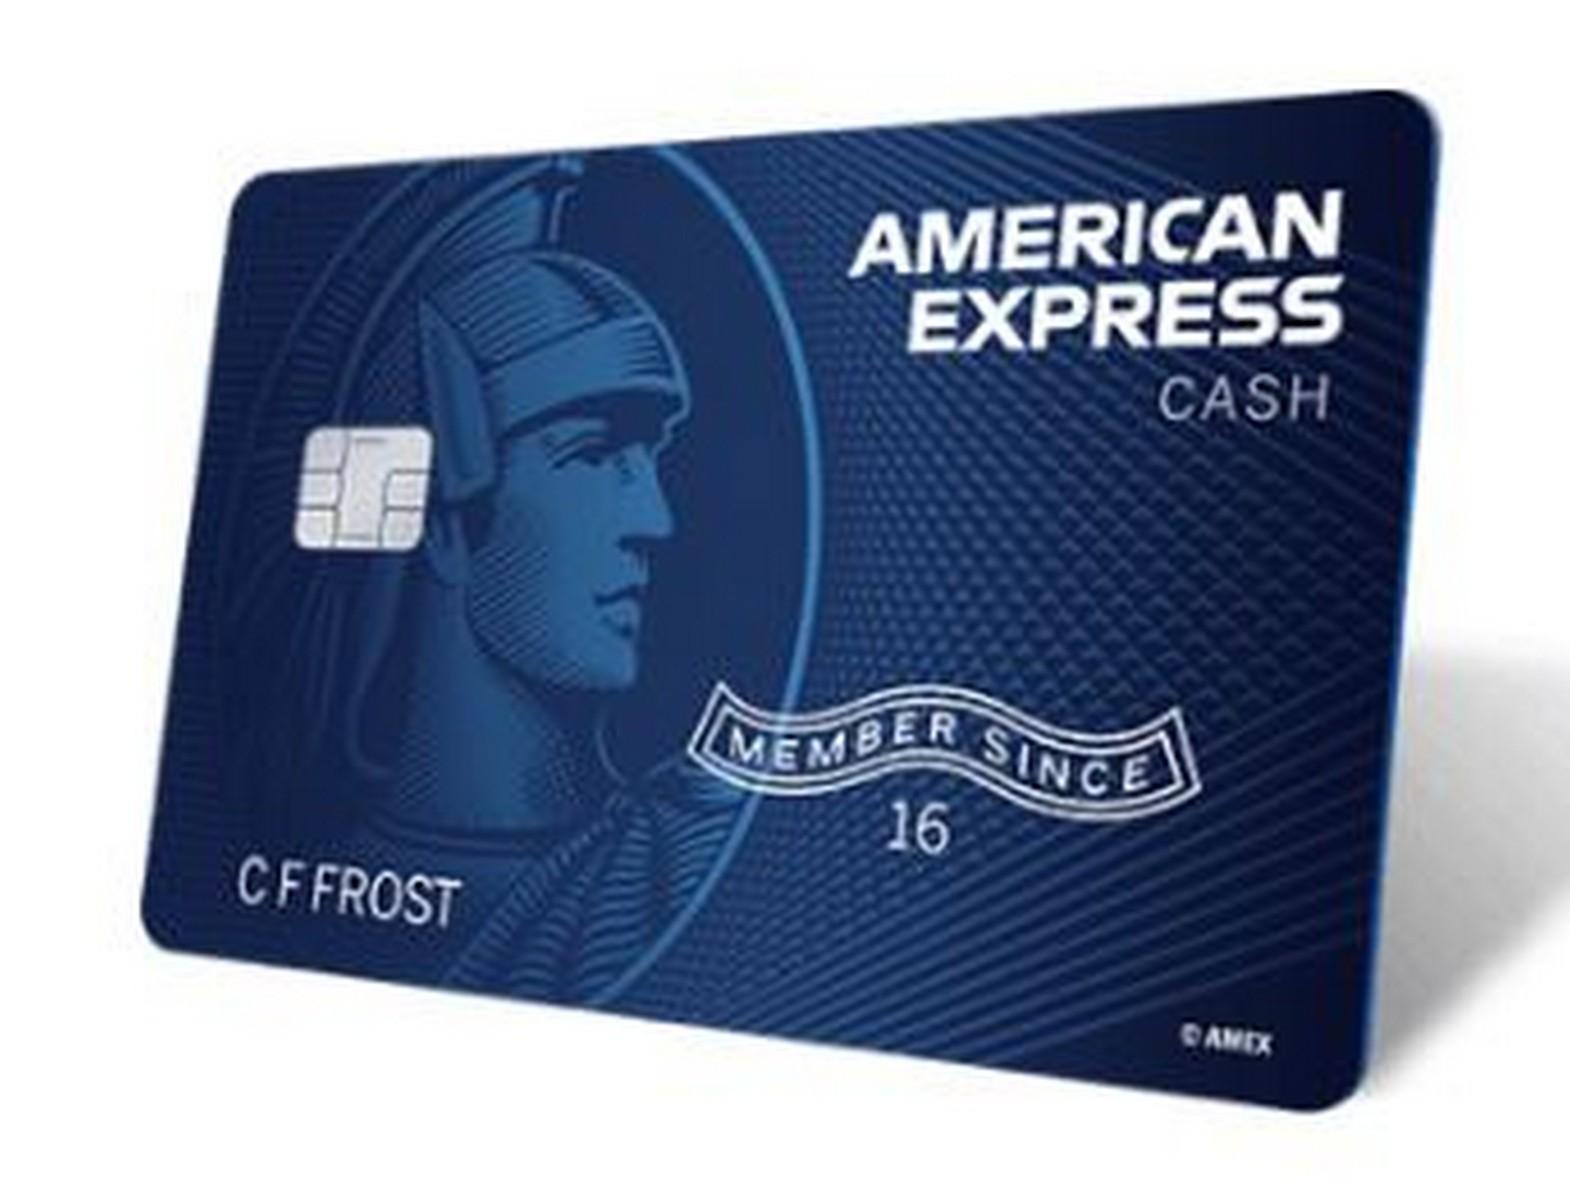 American express cash magnet credit card review 300 sign up bonus american express cash magnet credit card review 300 sign up bonus colourmoves